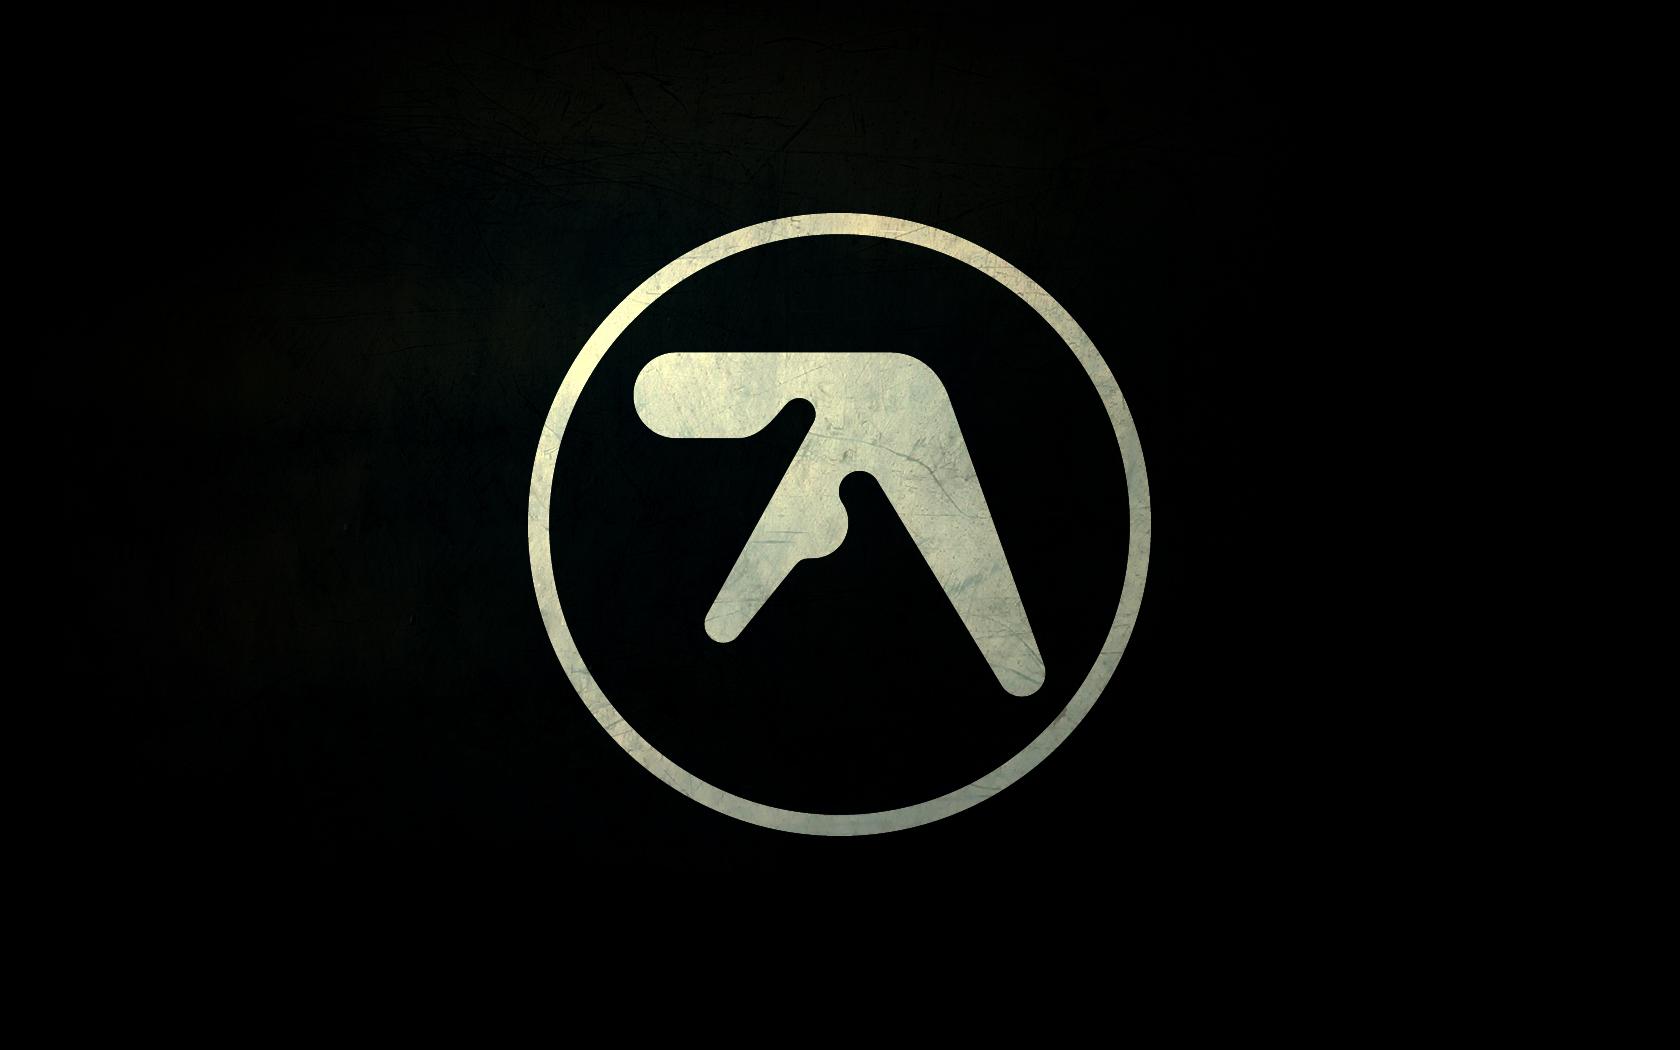 Aphex Twin announces Computer Controlled Acoustic Instruments pt2 EP